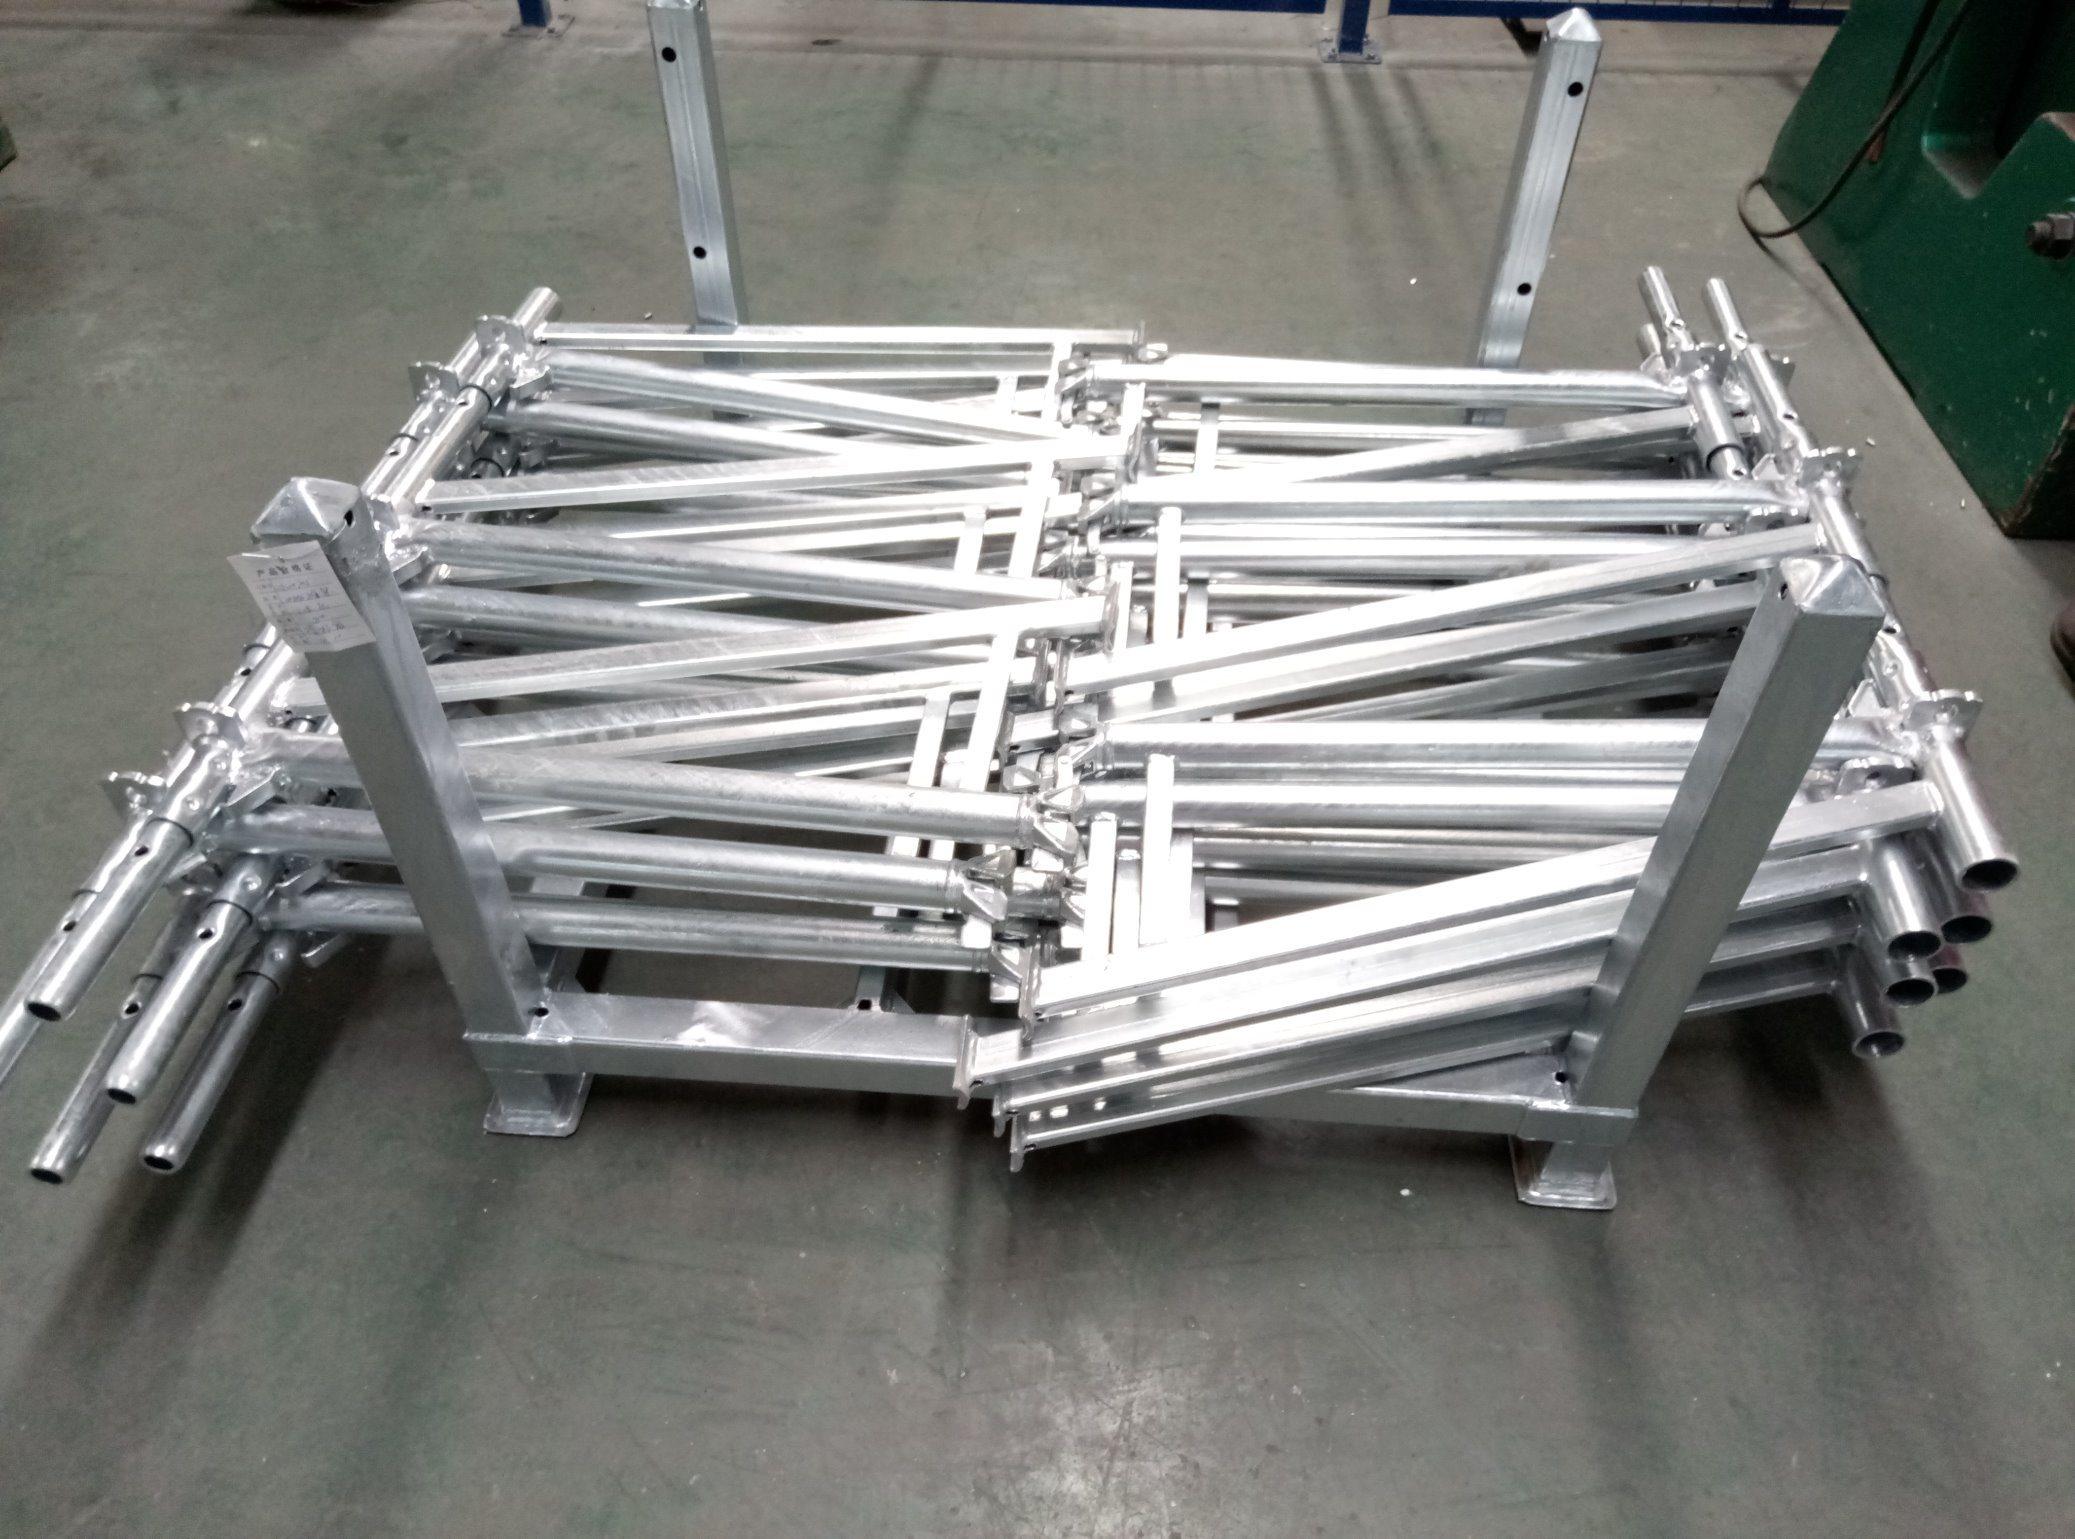 China Side Bracket for Scaffolding - China Bracket, Steel